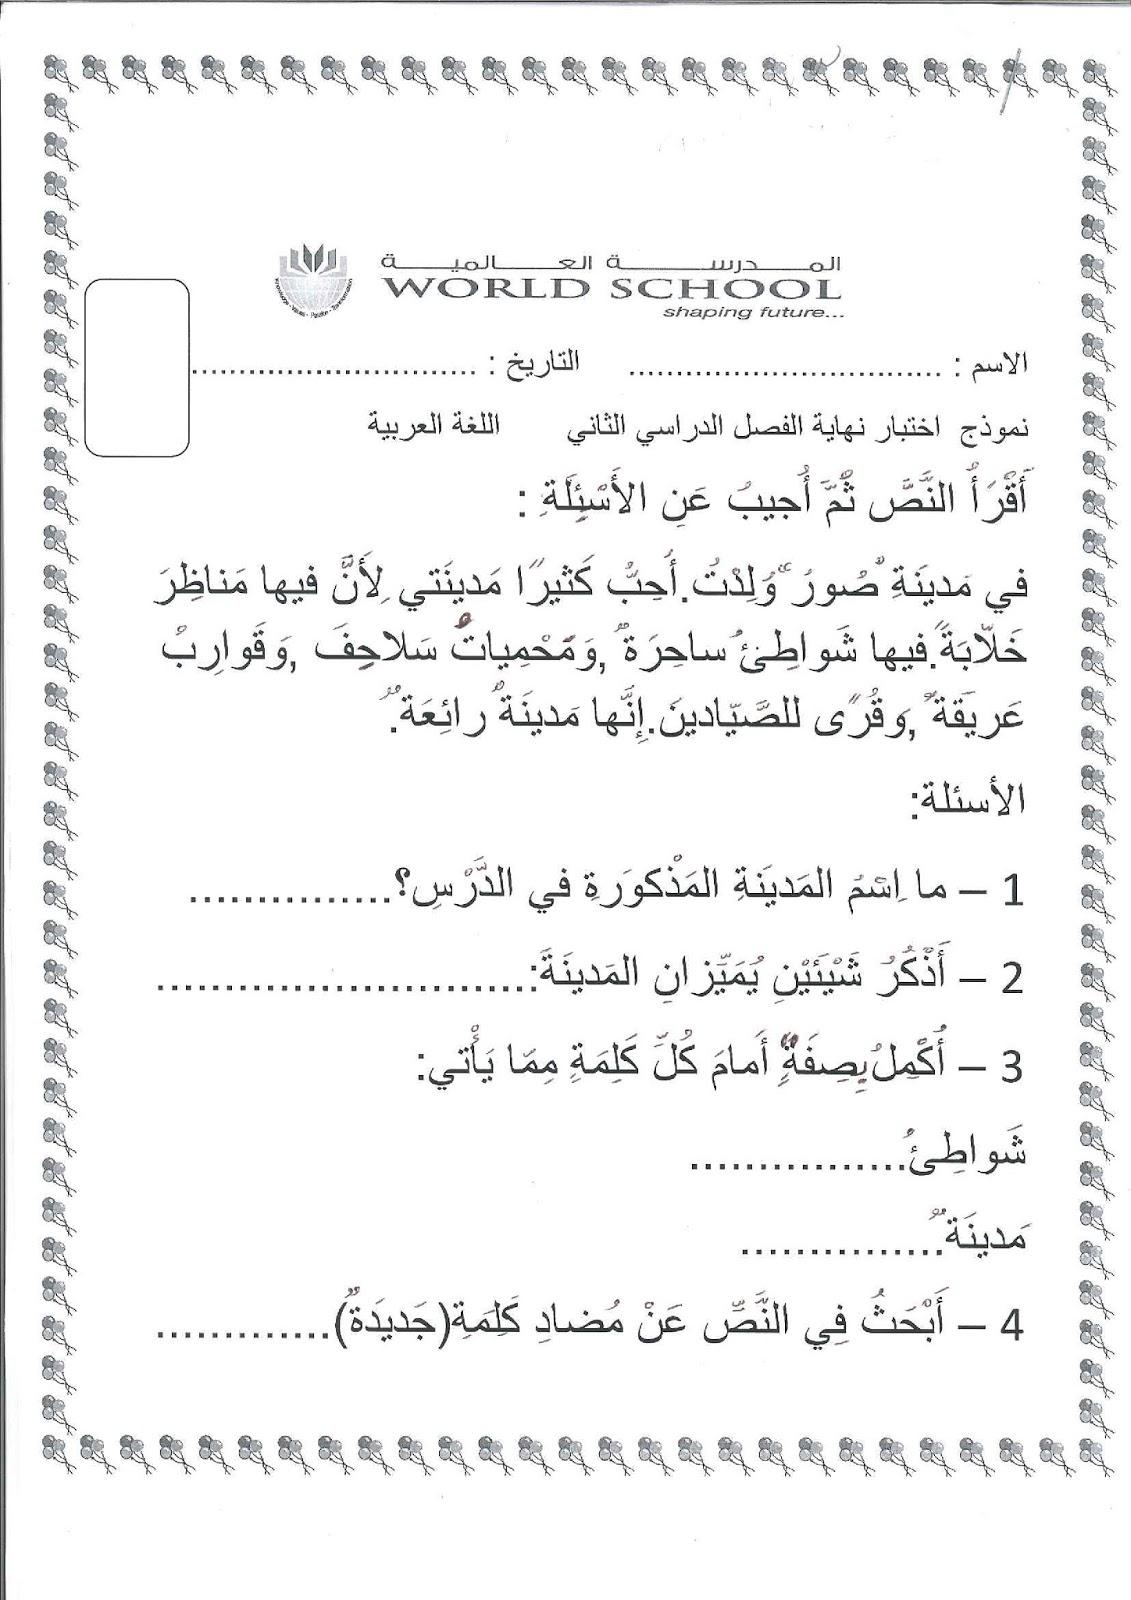 hight resolution of WORLD SCHOOL OMAN: May 2017